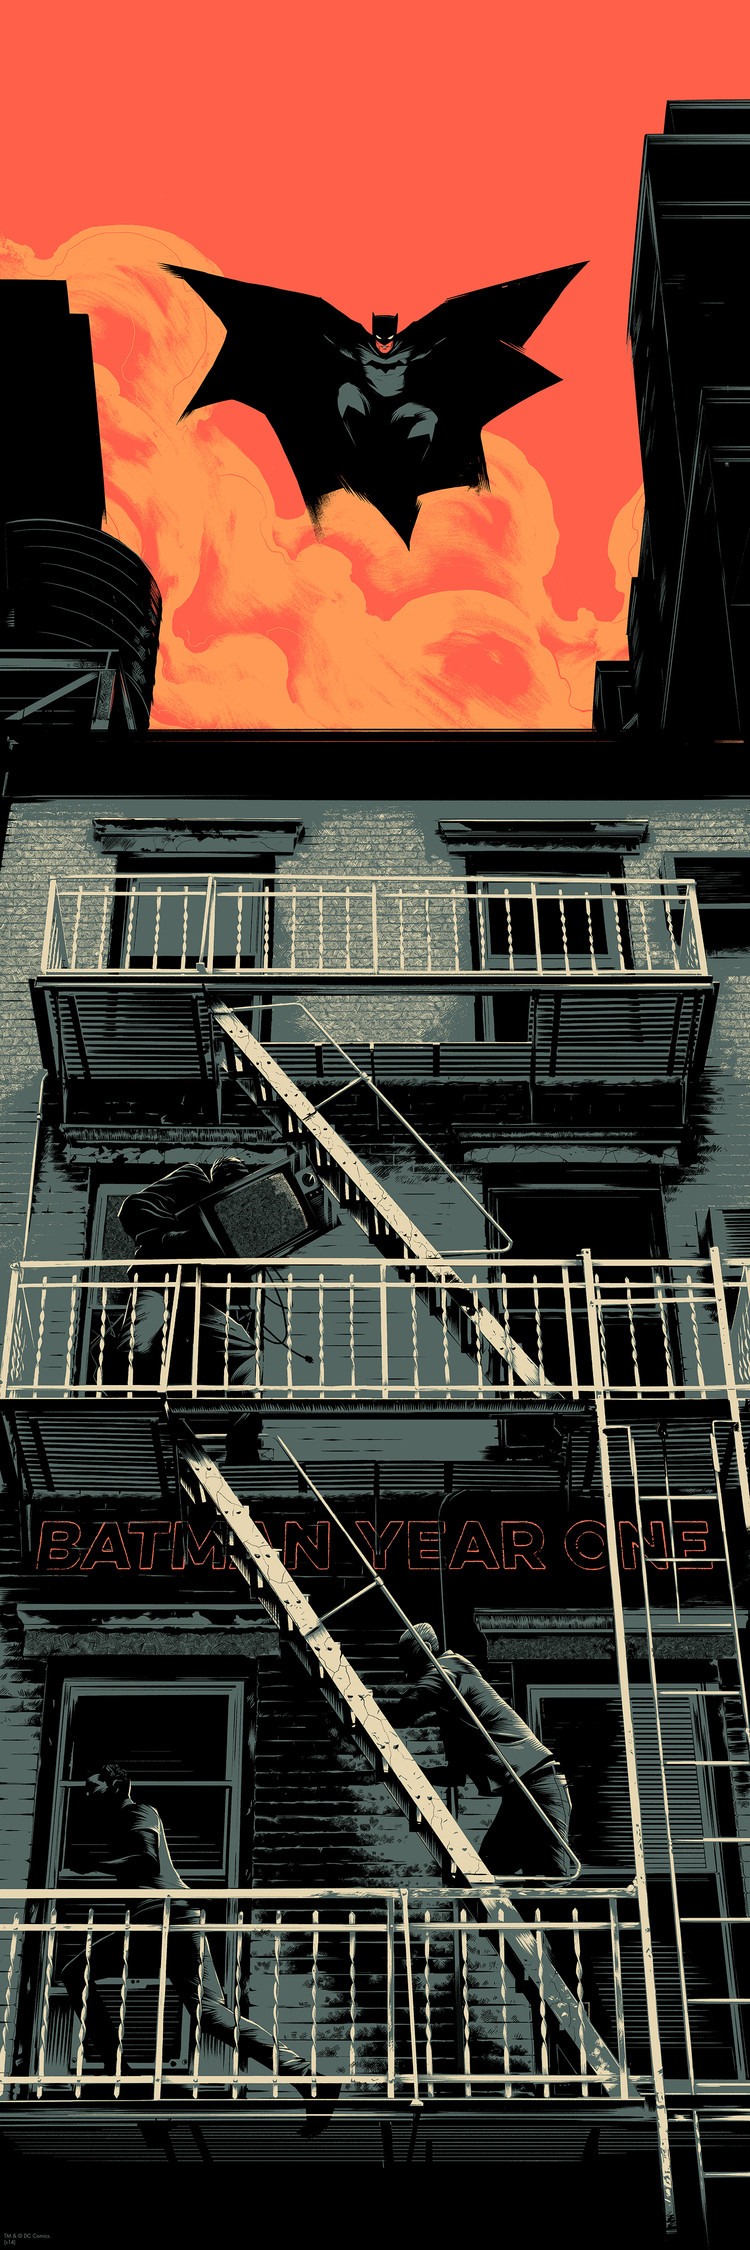 'Batman 75' by Matt Taylor for Mondo